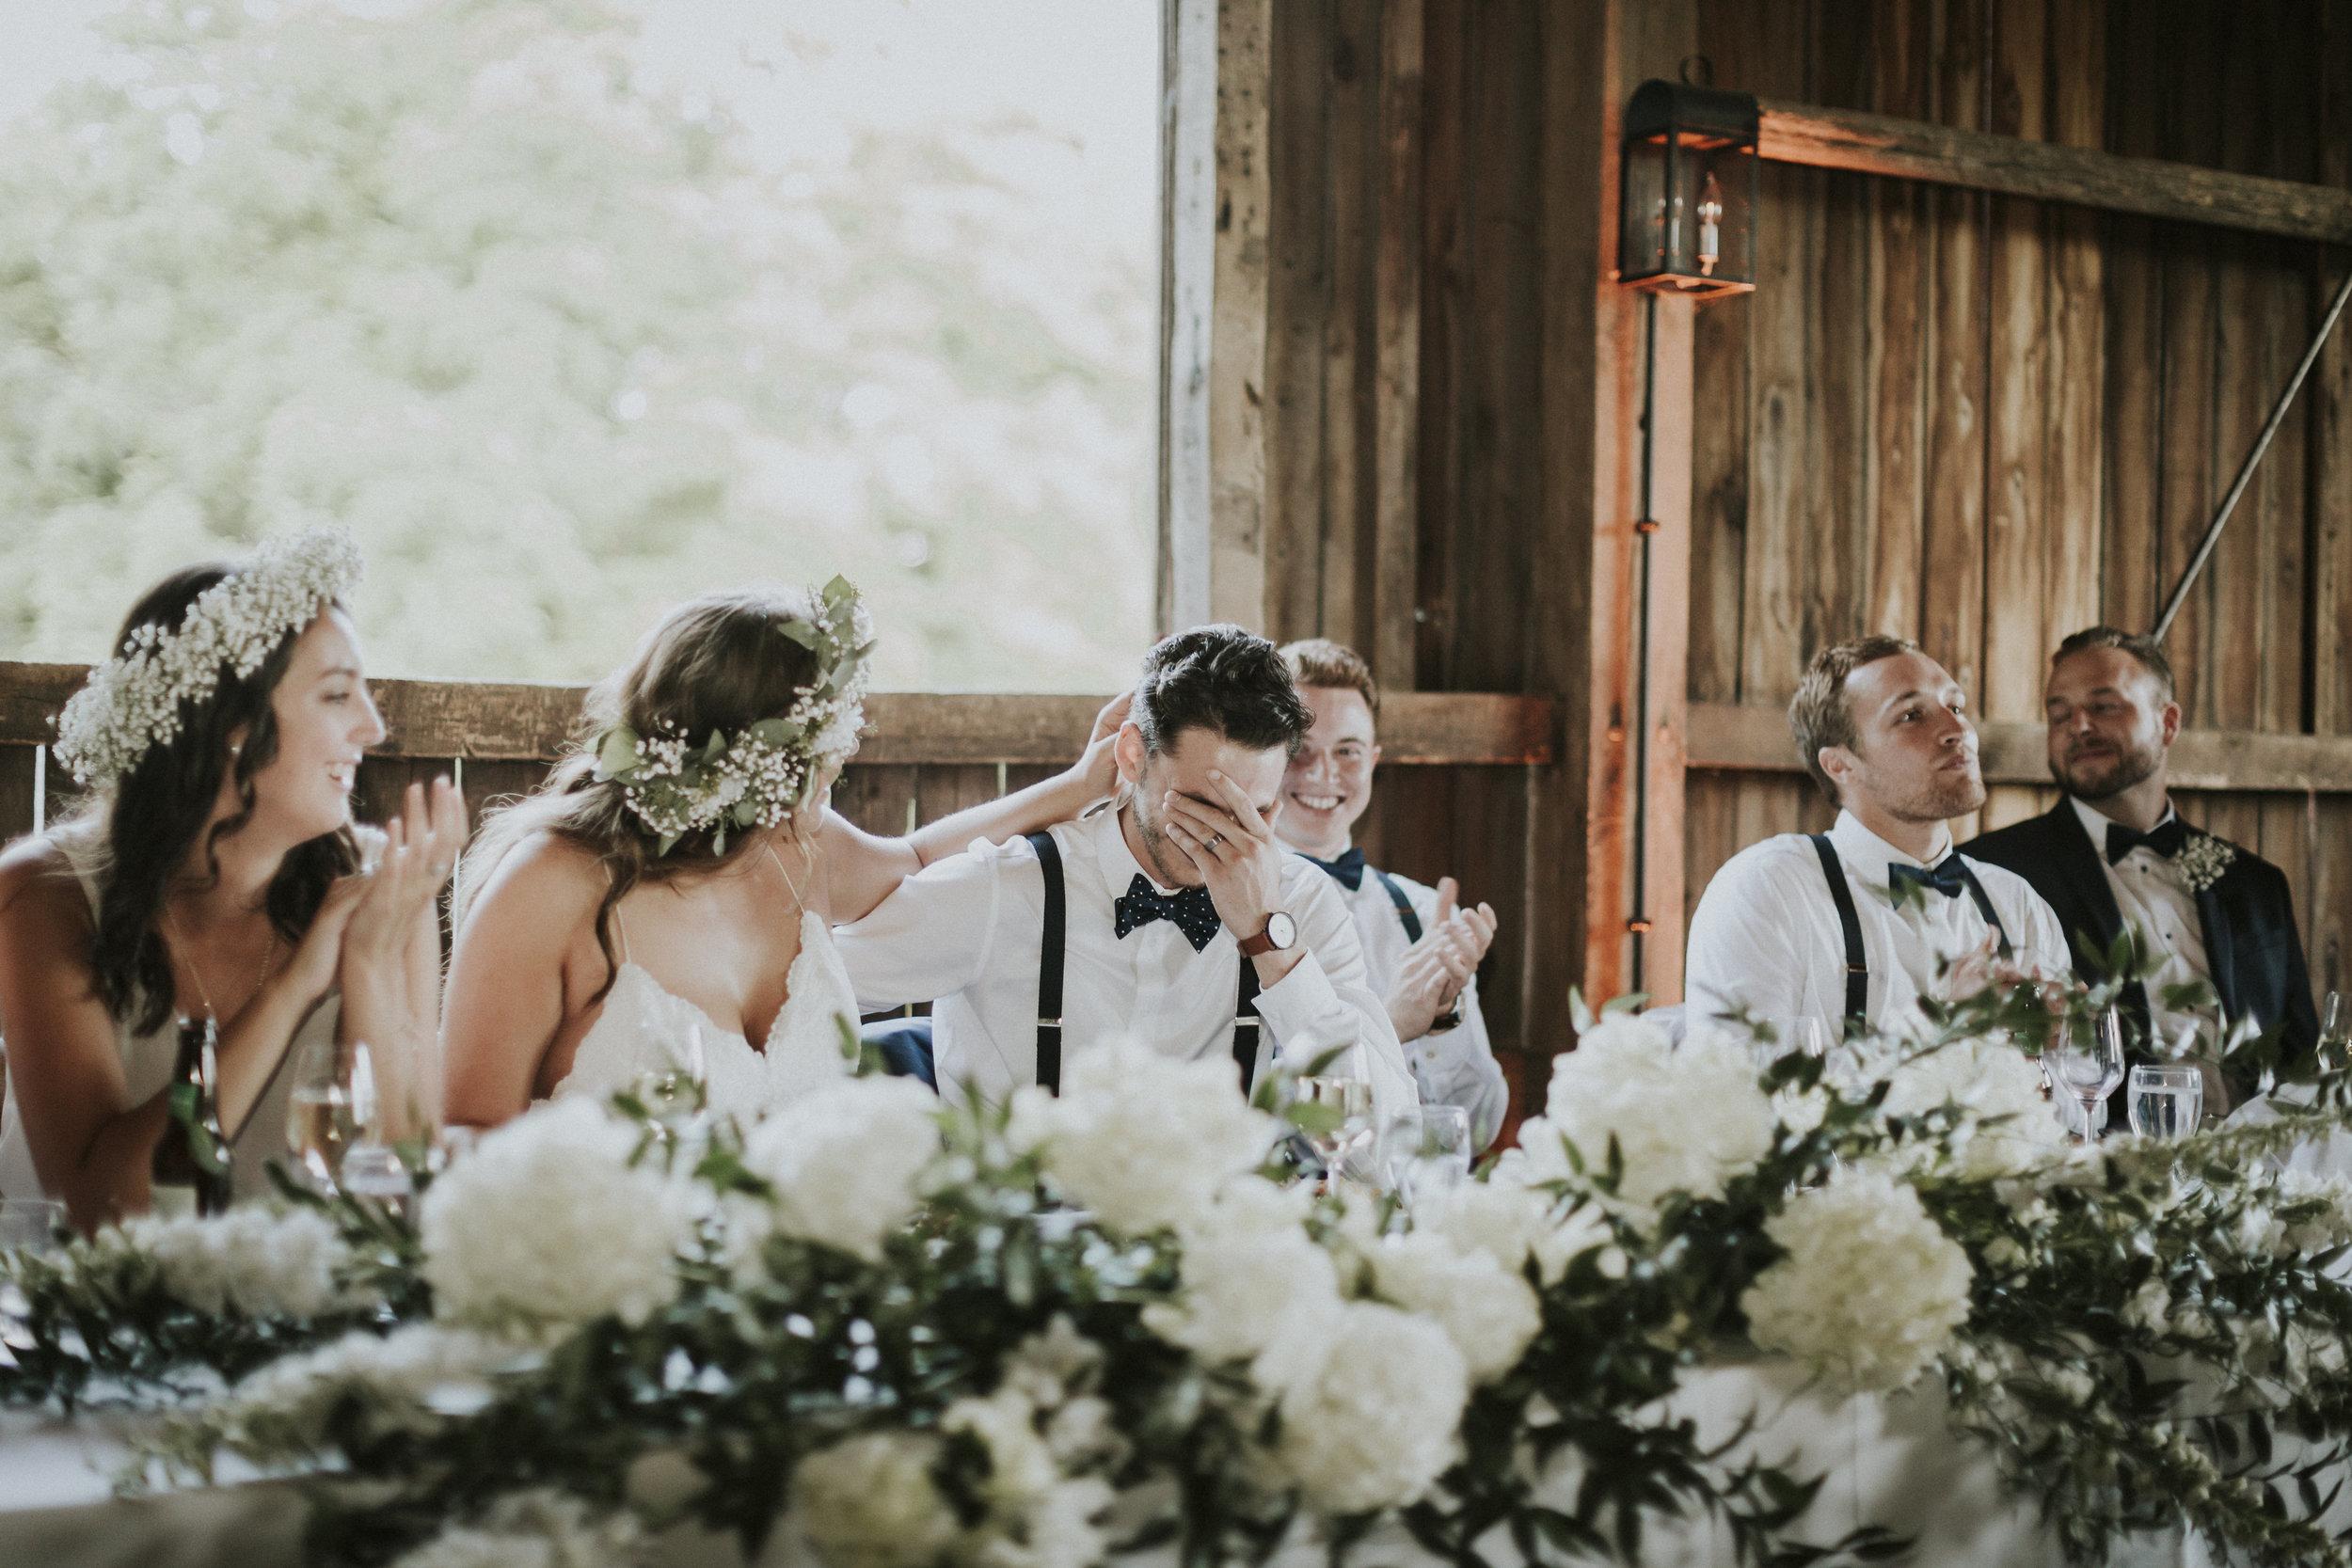 Courtney+Lawrence_Wedding_67.jpg